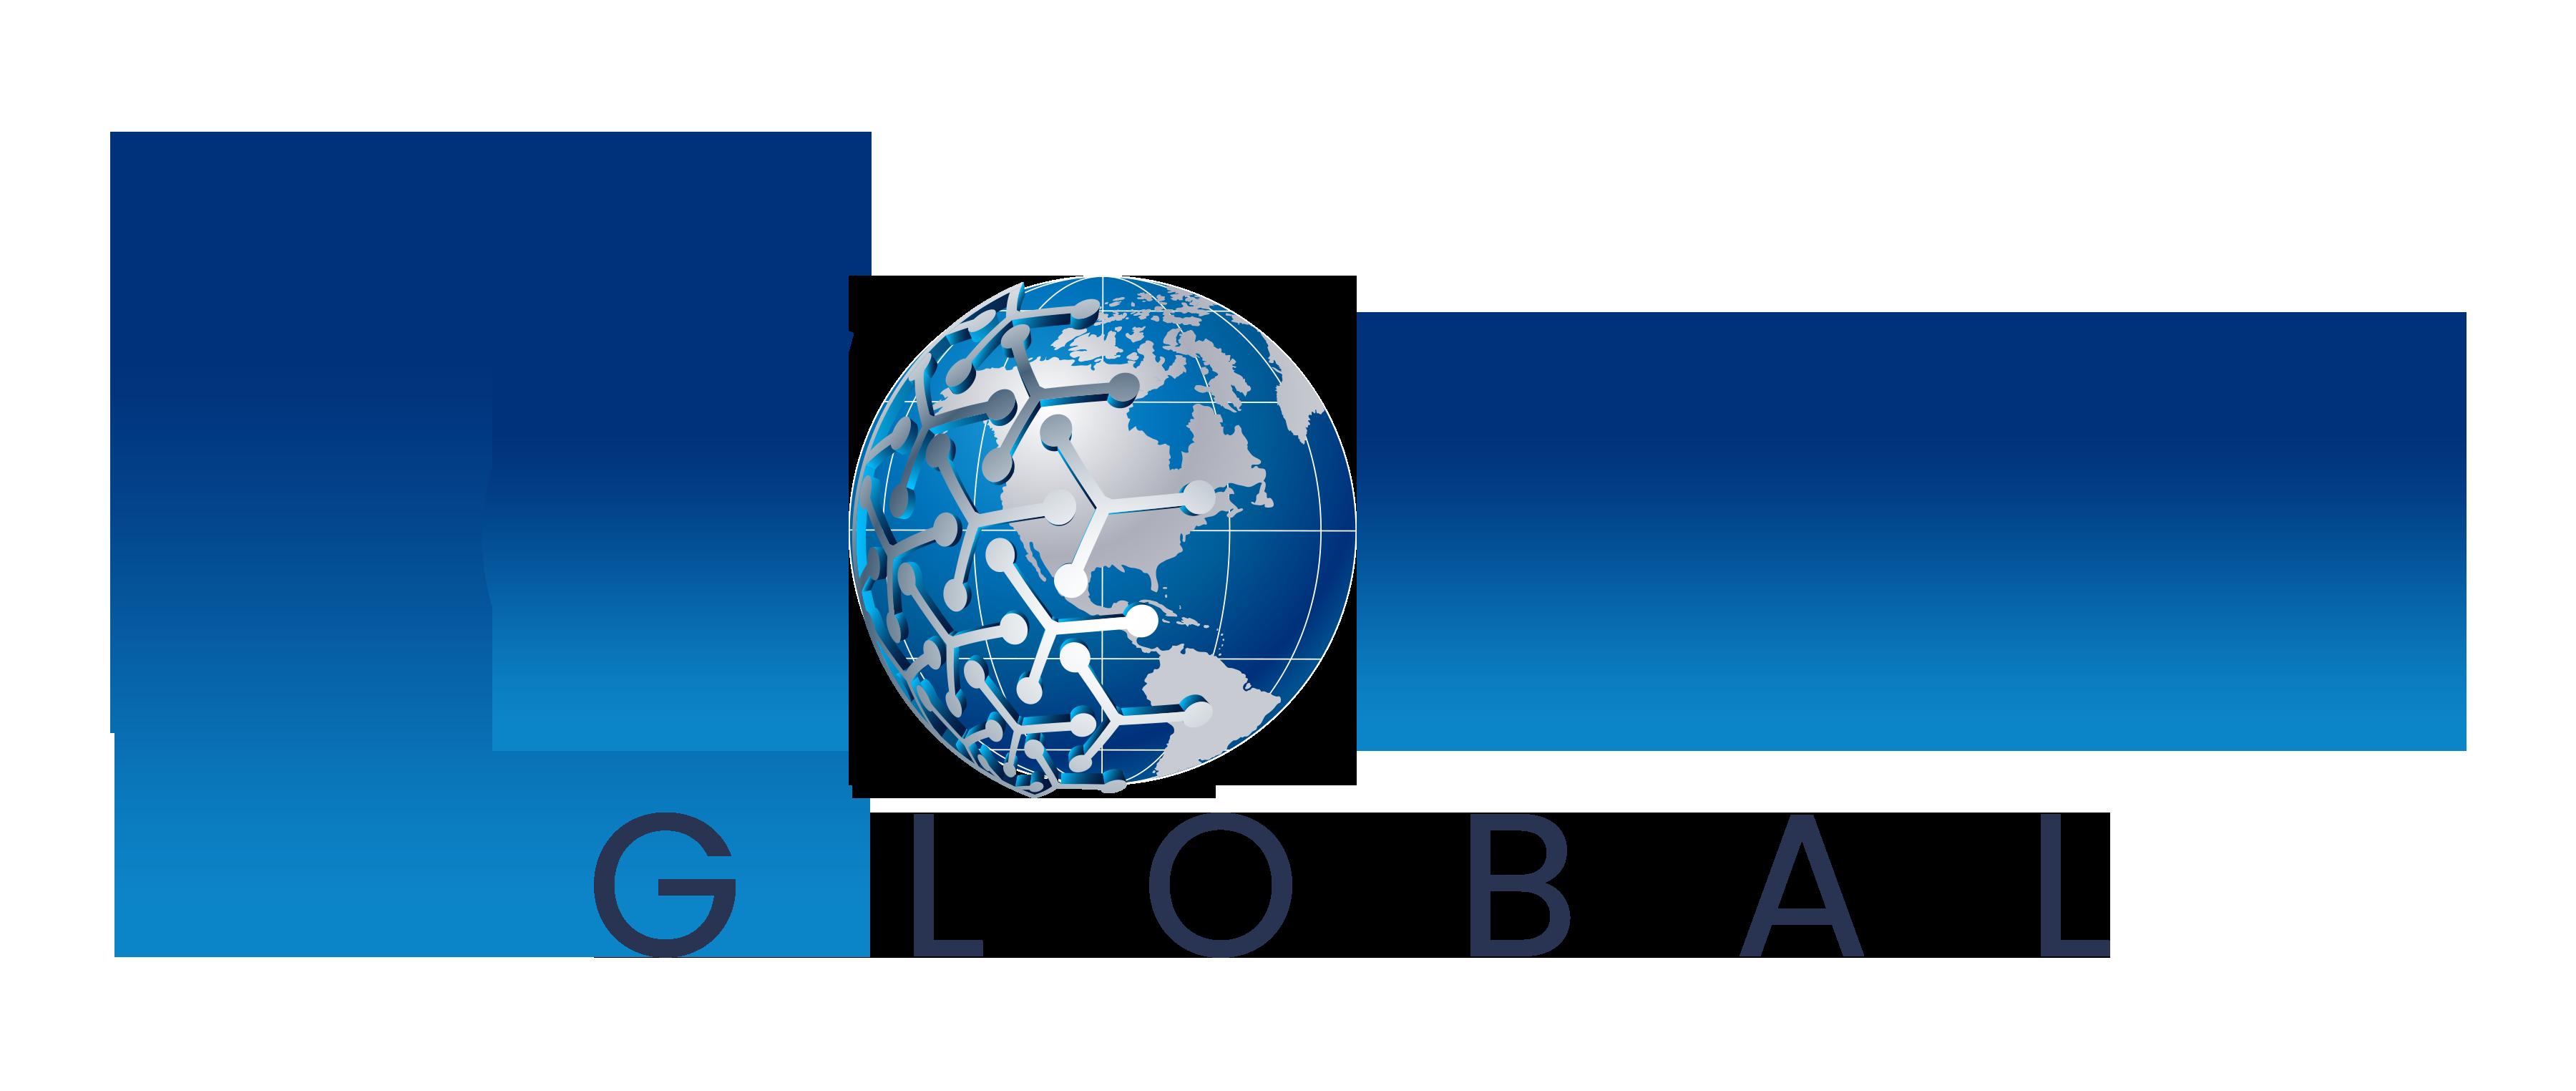 T-Comm-Global-Logo-004